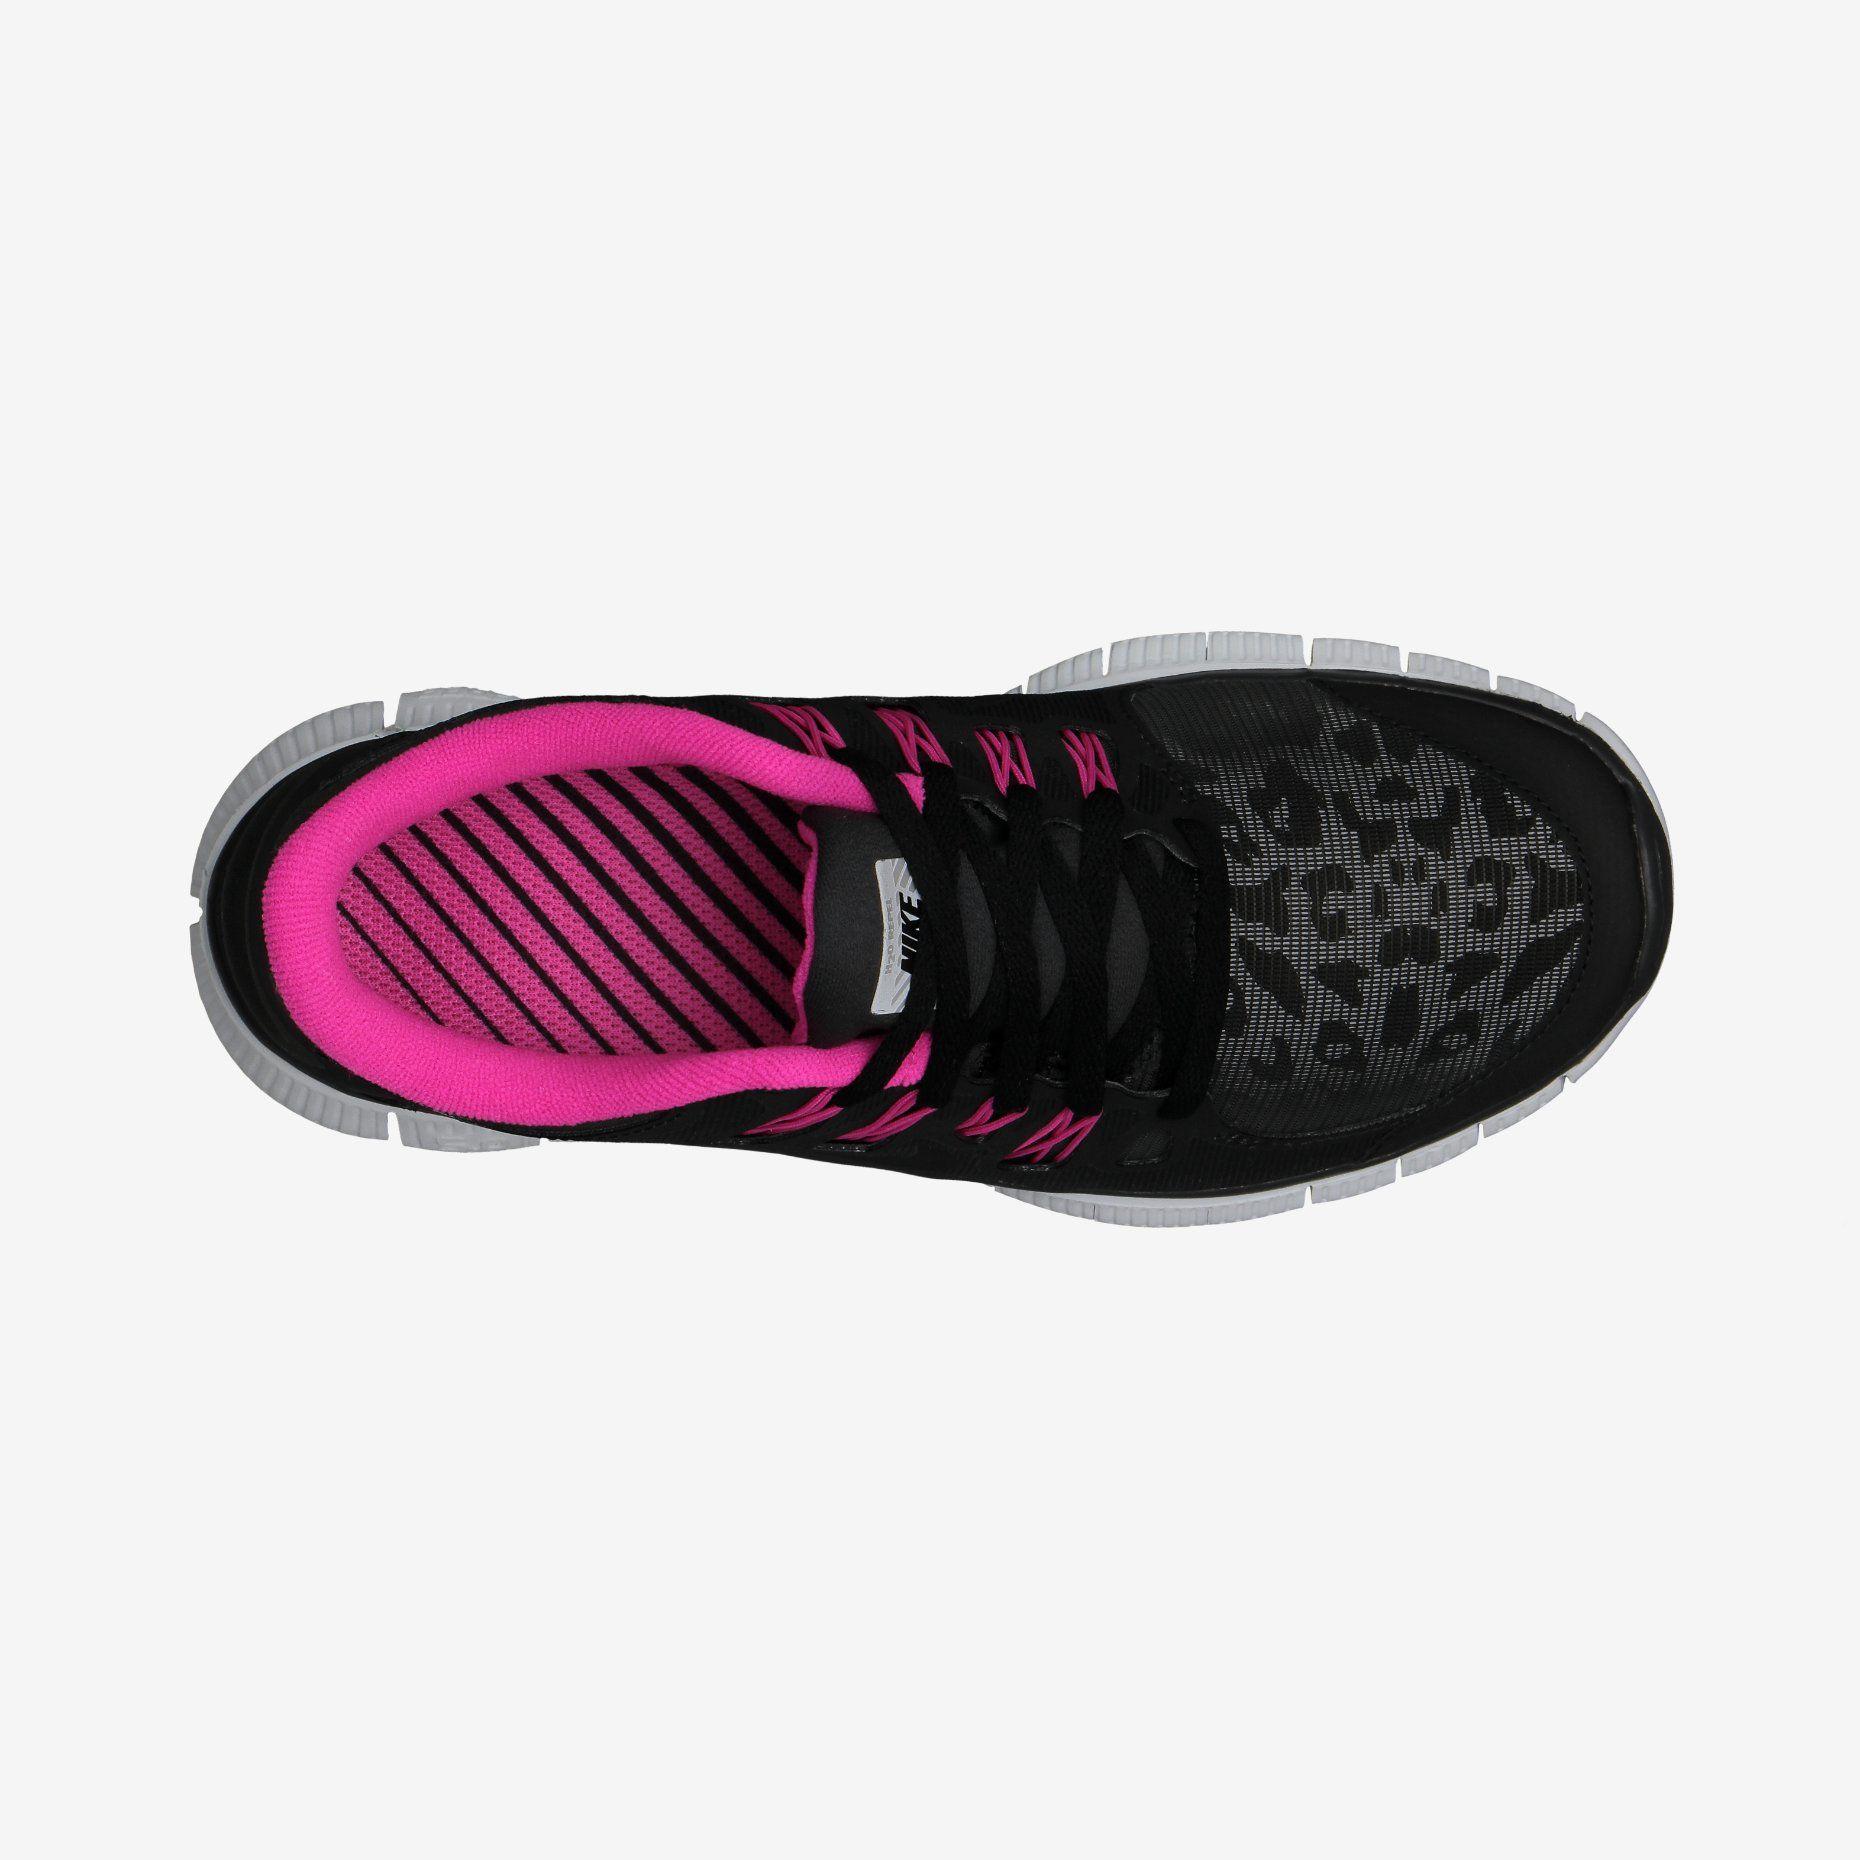 9bb26692c68ab Nike Store. Nike Free 5.0 Shield Women s Running Shoe Love the cheetah  detail!!